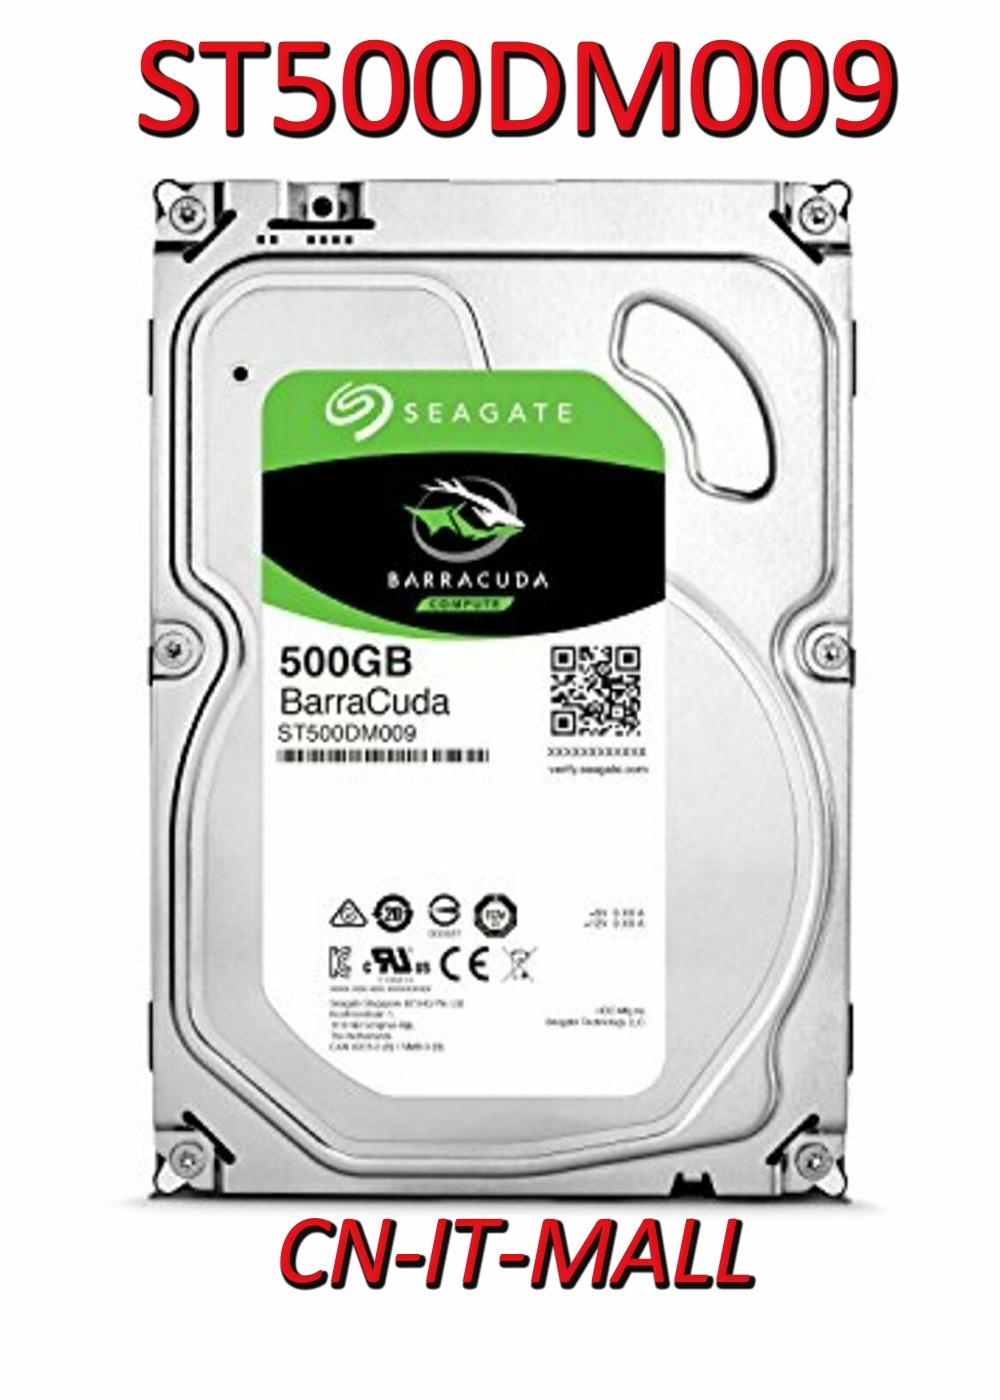 "Seagate BarraCuda ST500DM009 500GB 7200 RPM 32MB Cache SATA 6.0Gb/s 3.5"" Hard Drive"